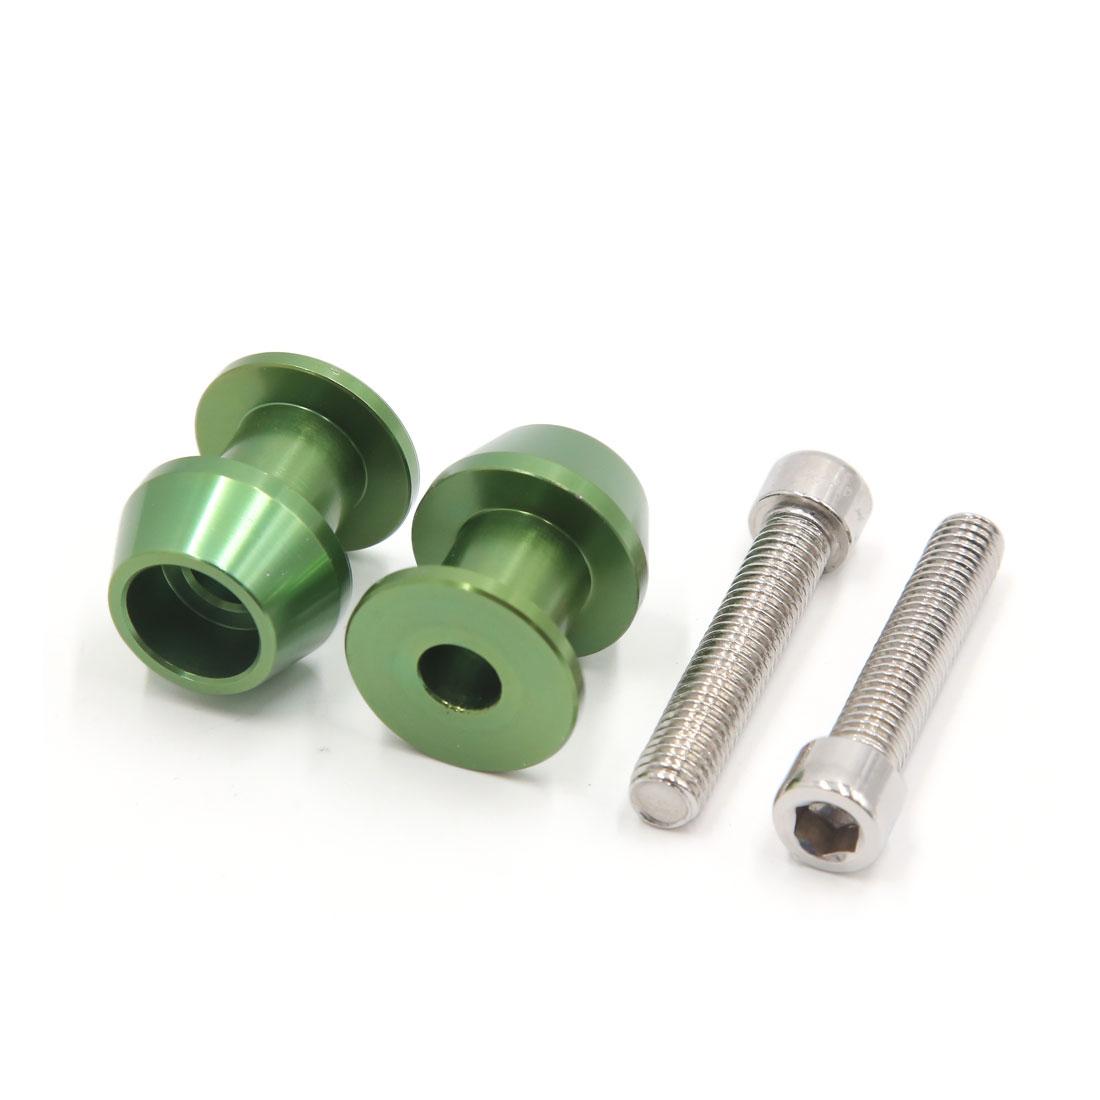 Pair Green Metal 8mm Thread Dia CNC Swingarm Spools Sliders Stand Bobbins